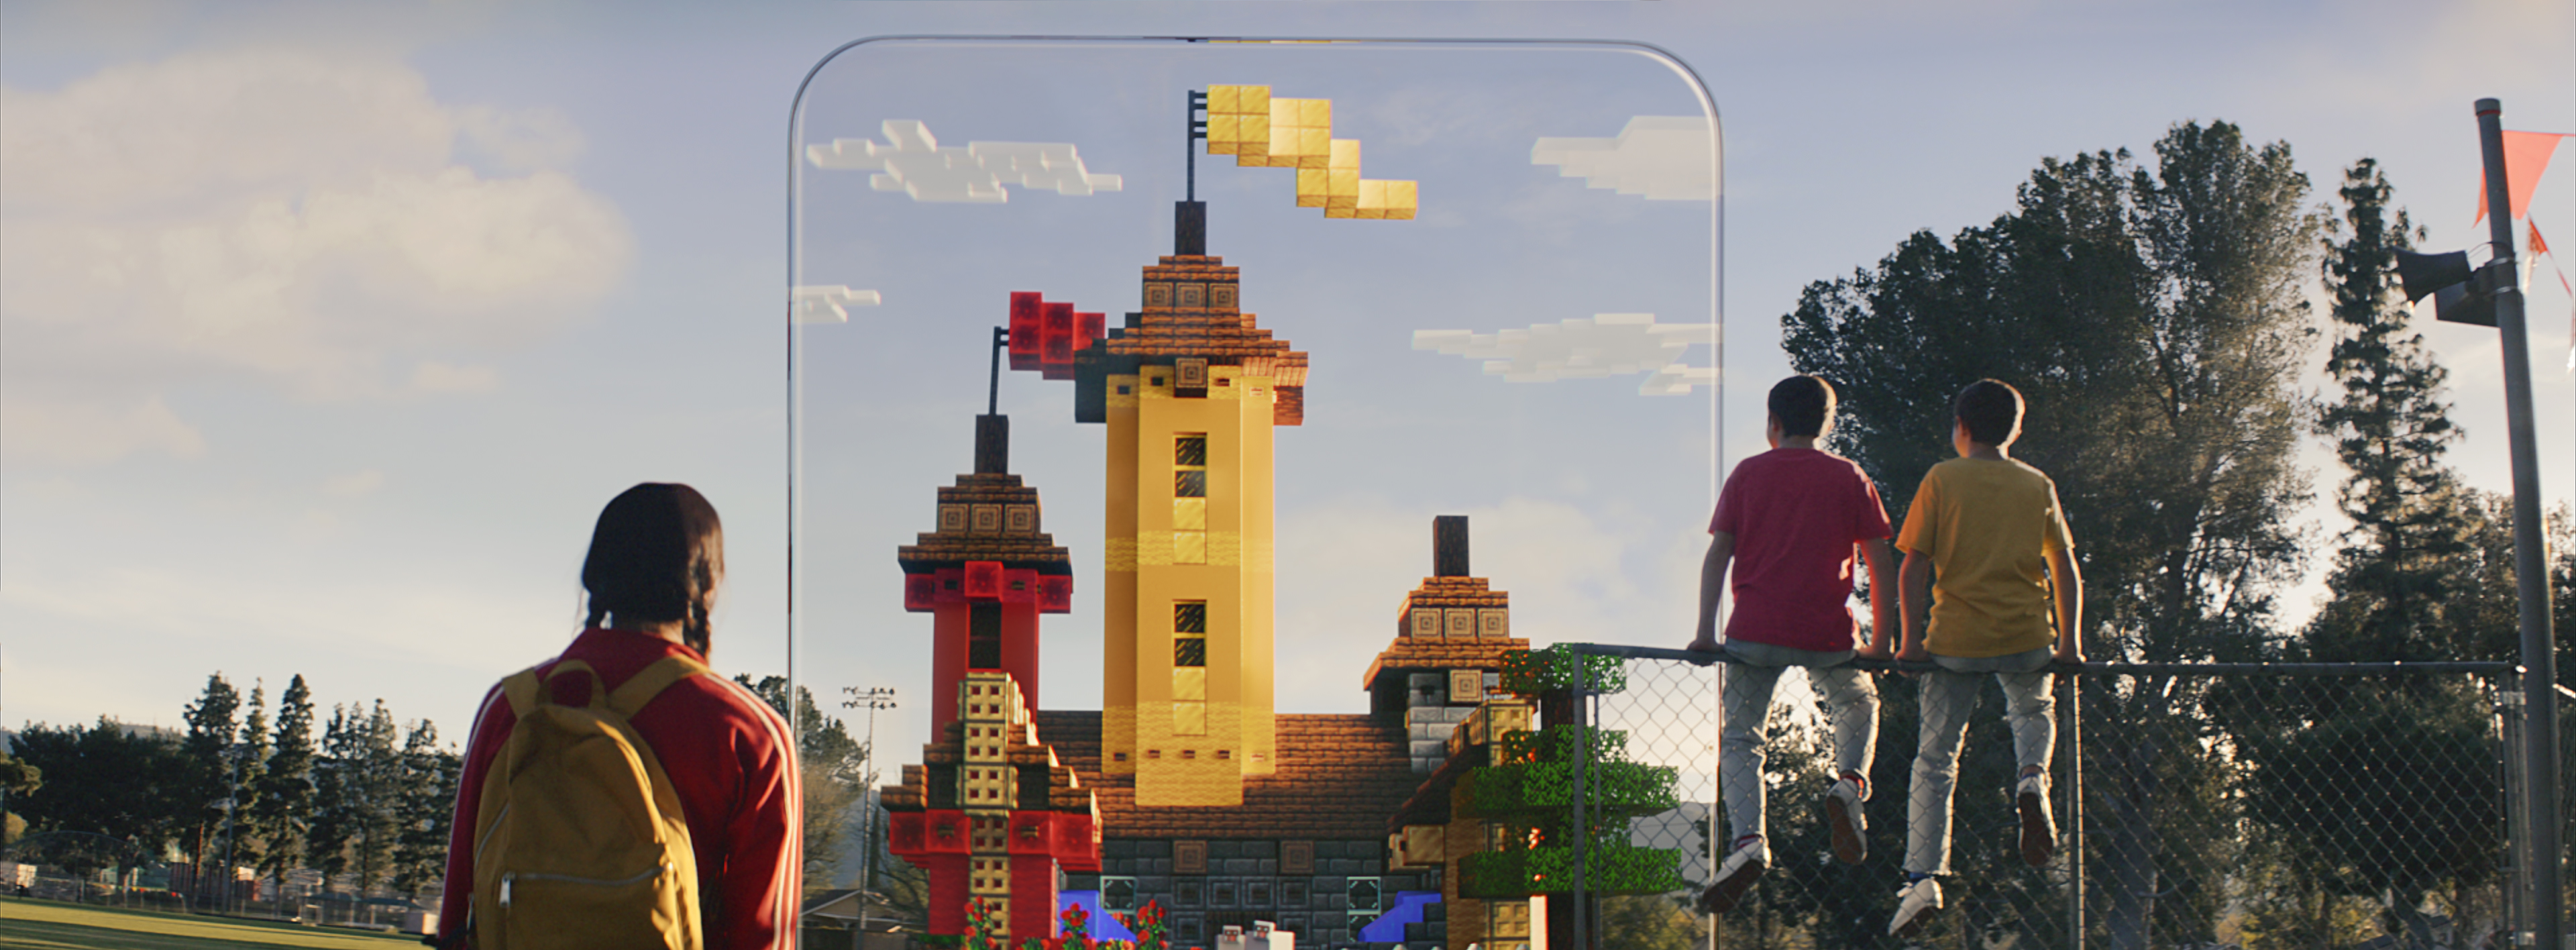 Minecraft Earth is Microsoft's wild shot at the next Pokemon Go-style AR blockbuster